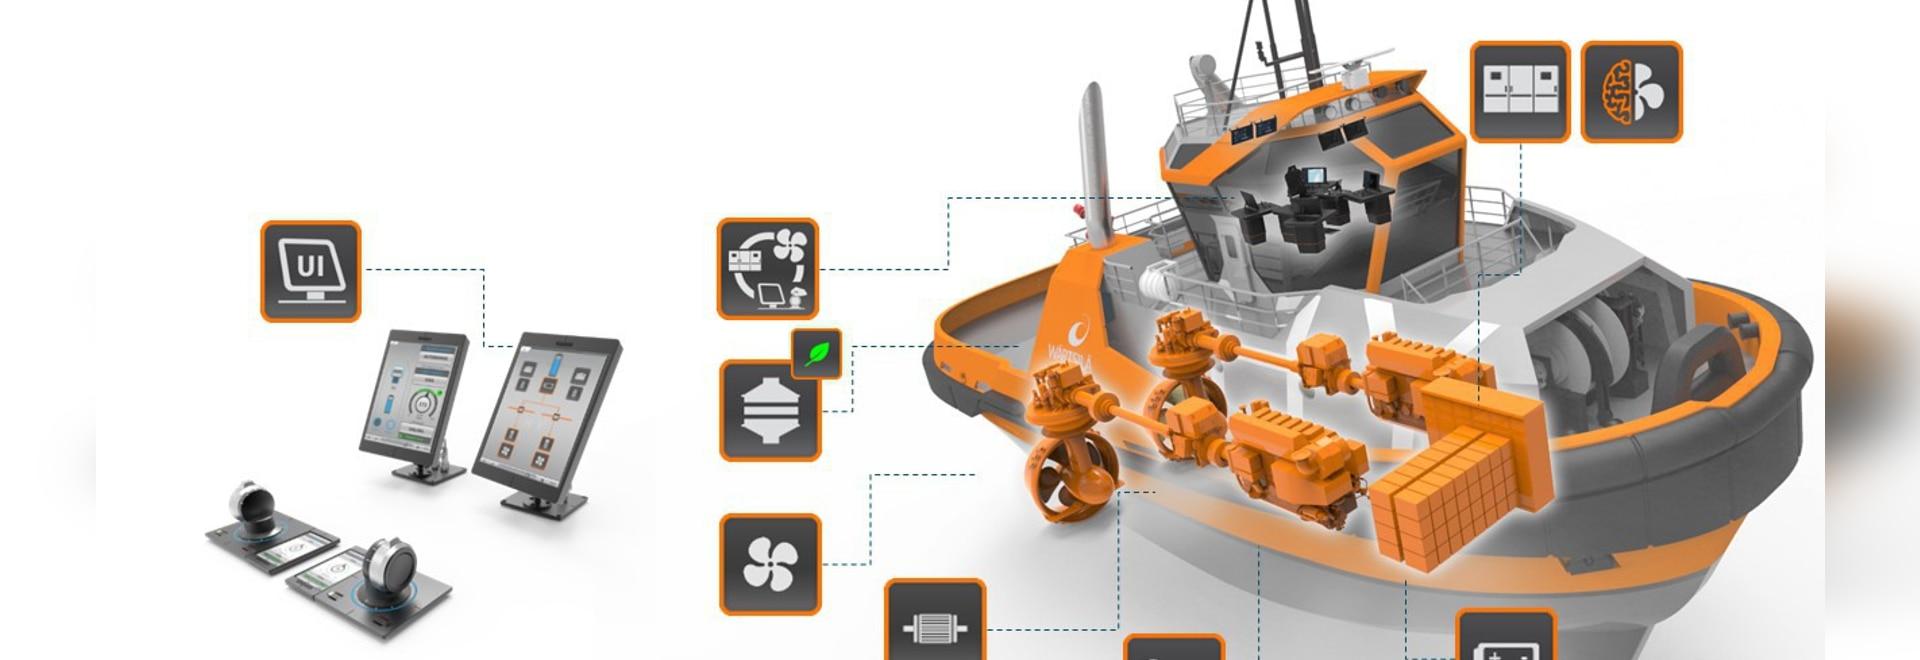 Installation hybride de développement de module d'alimentation du HY de Wärtsilä en plein rendement